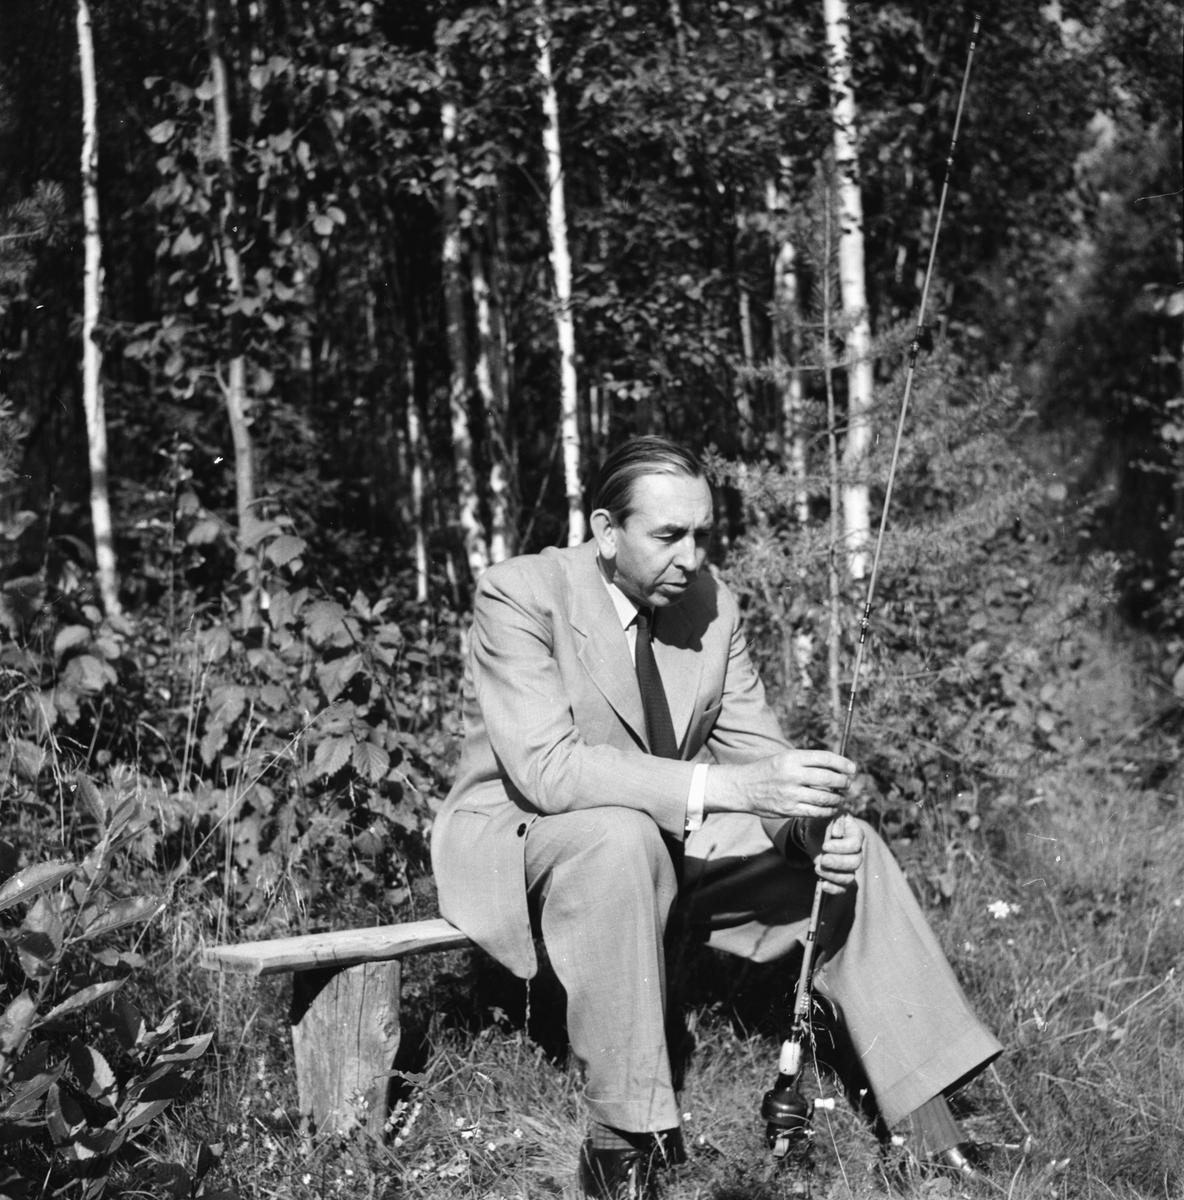 Lidman Hans Edsbyn 21 aug 1961